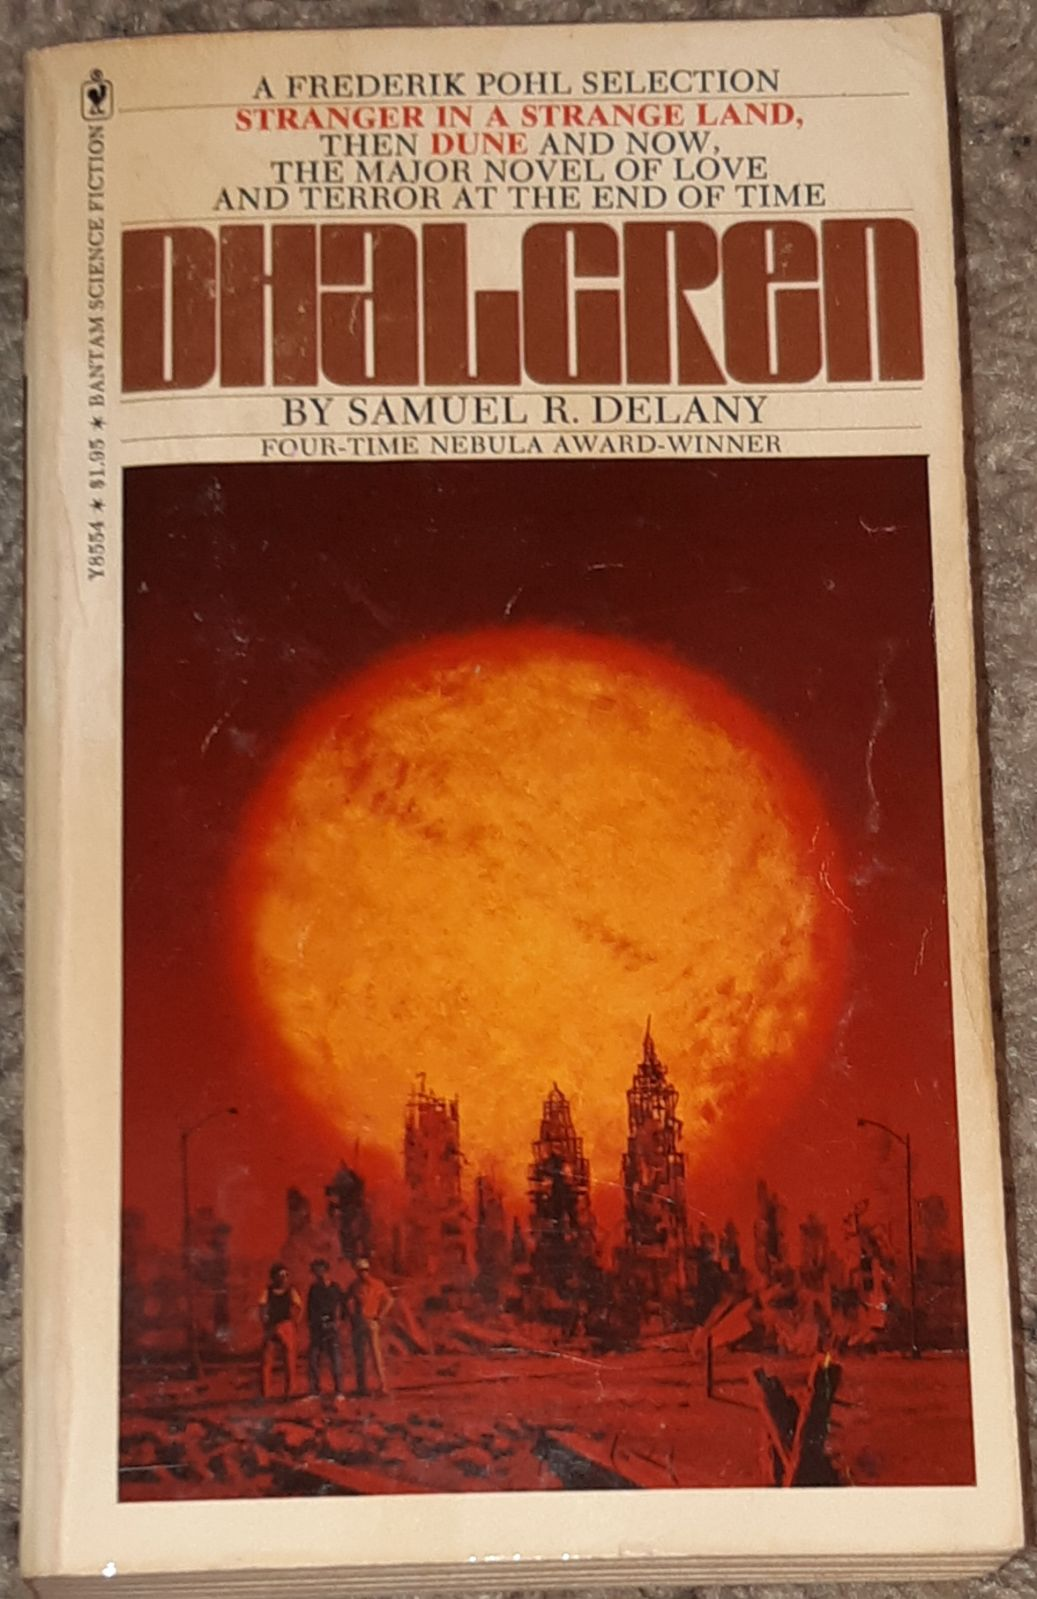 Dhalgren 1975 Paperback Samuel R. Delany